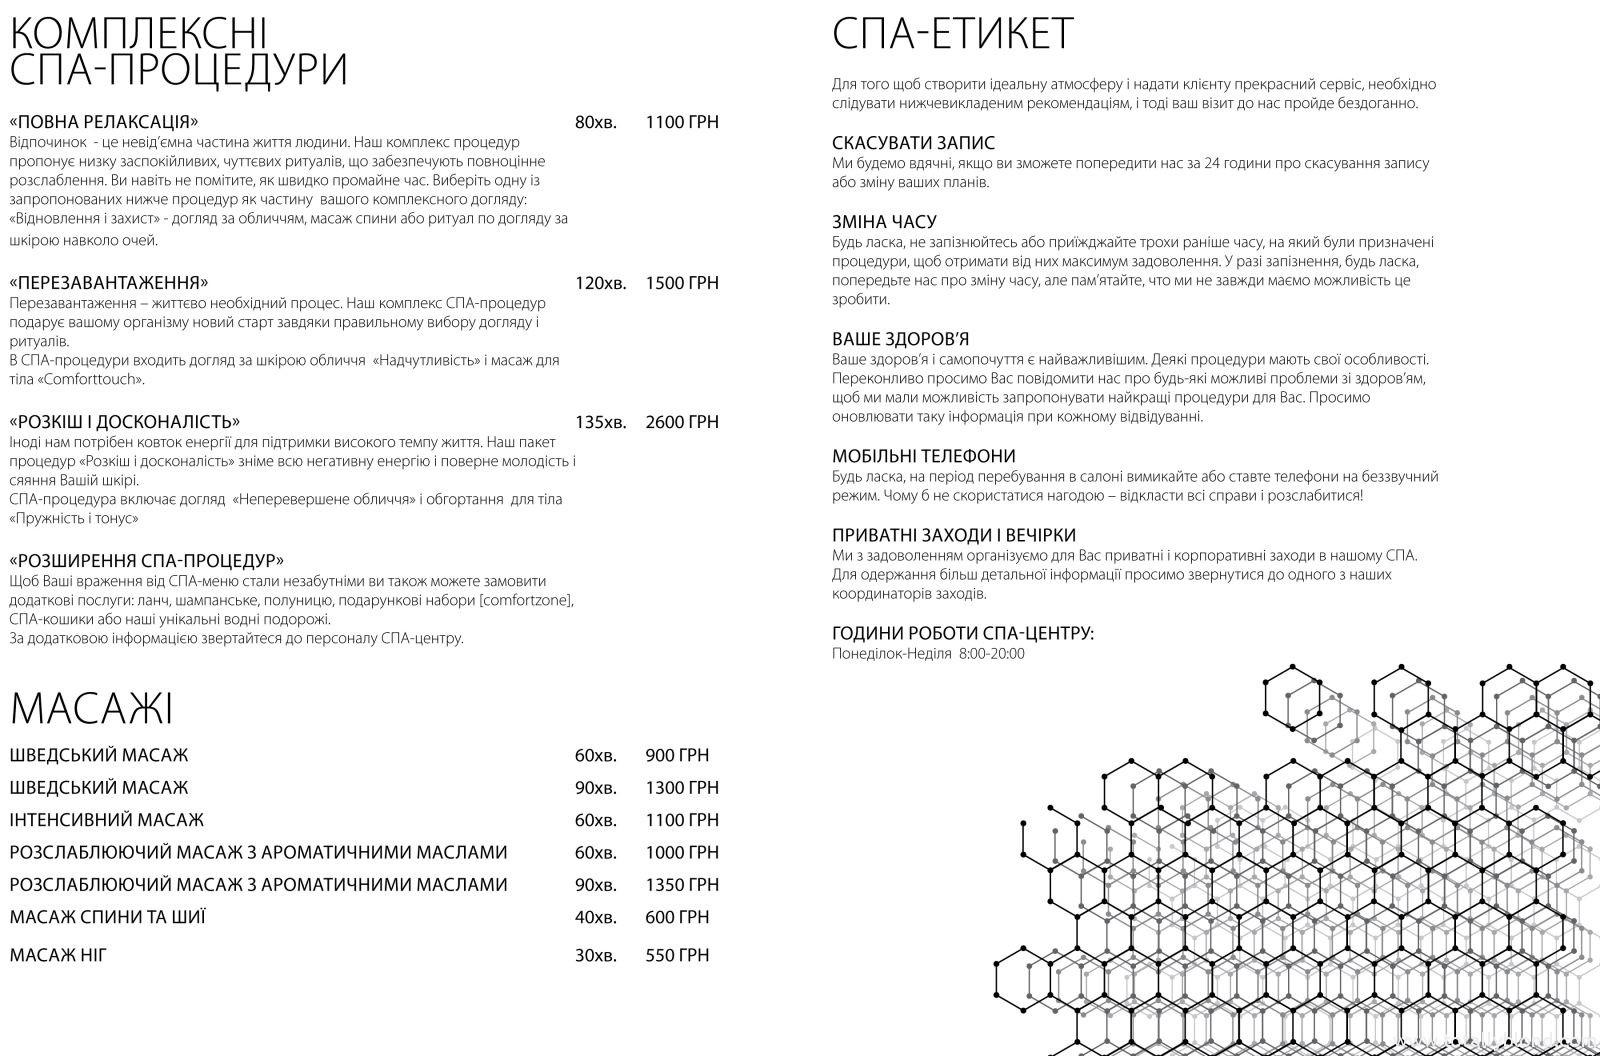 Hilton Kyiv Spa Menu - UA-6